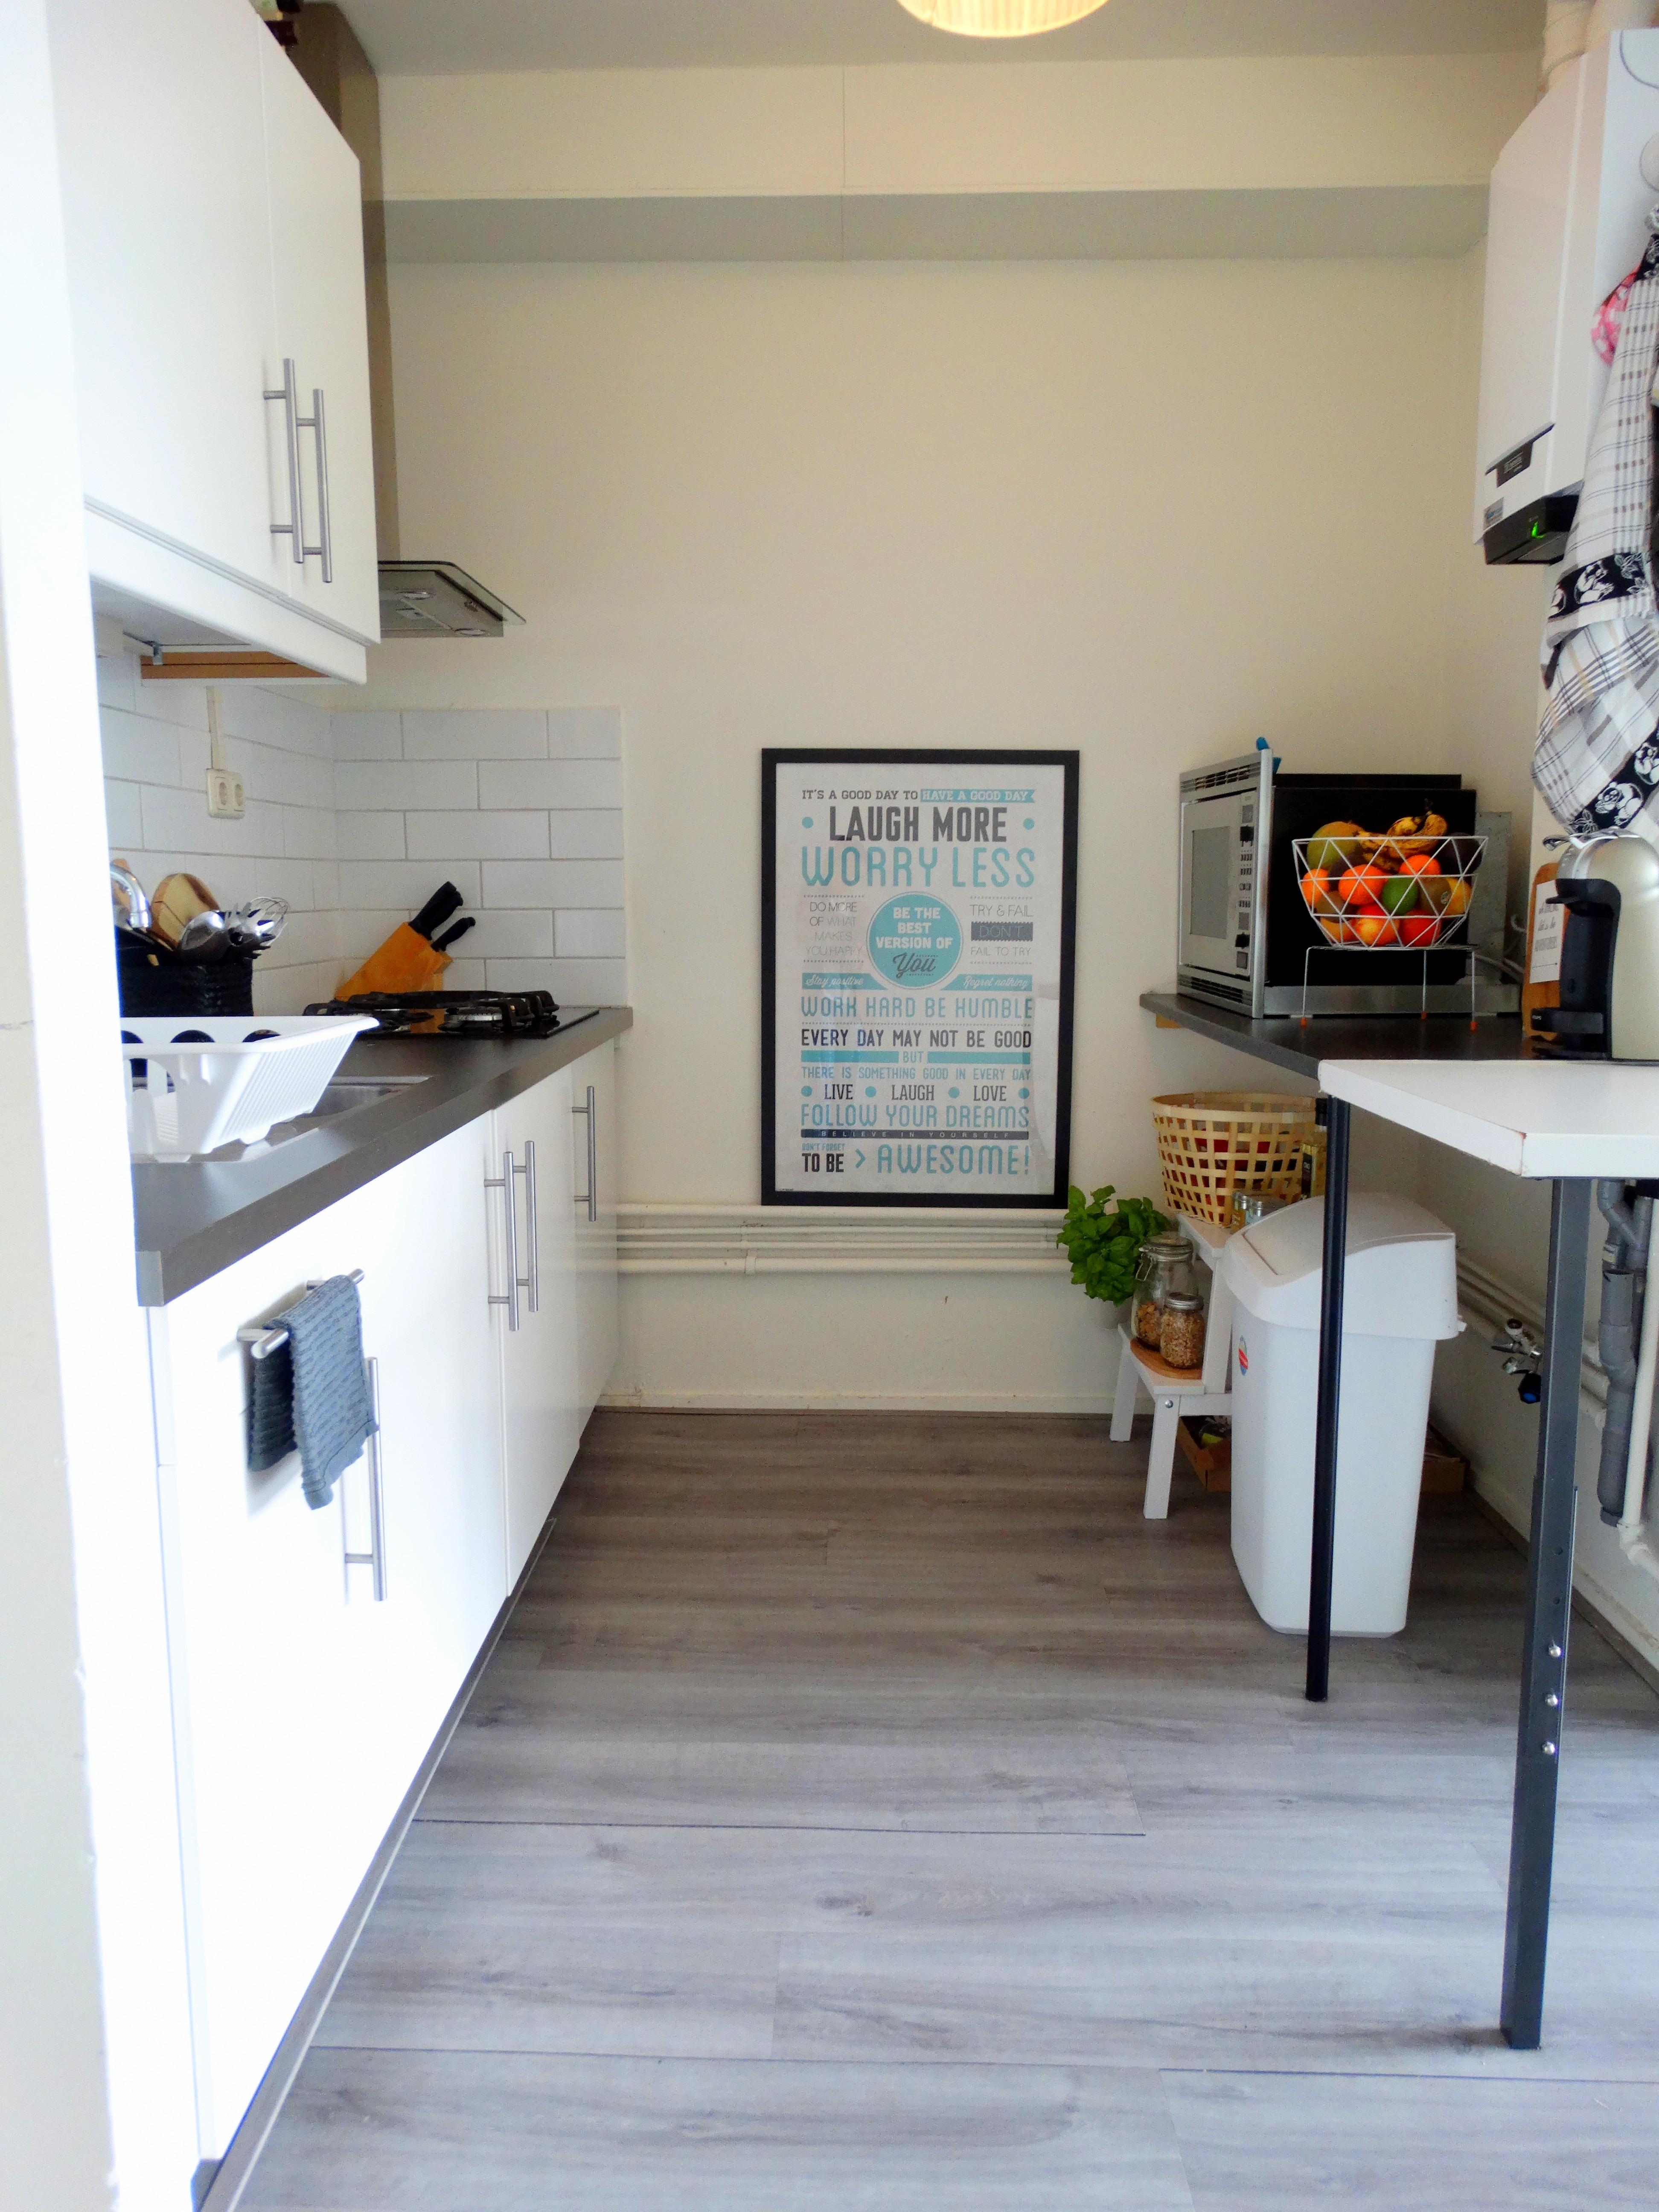 ♥ kijkje in mijn nieuwe keuken   toutes les belles choses